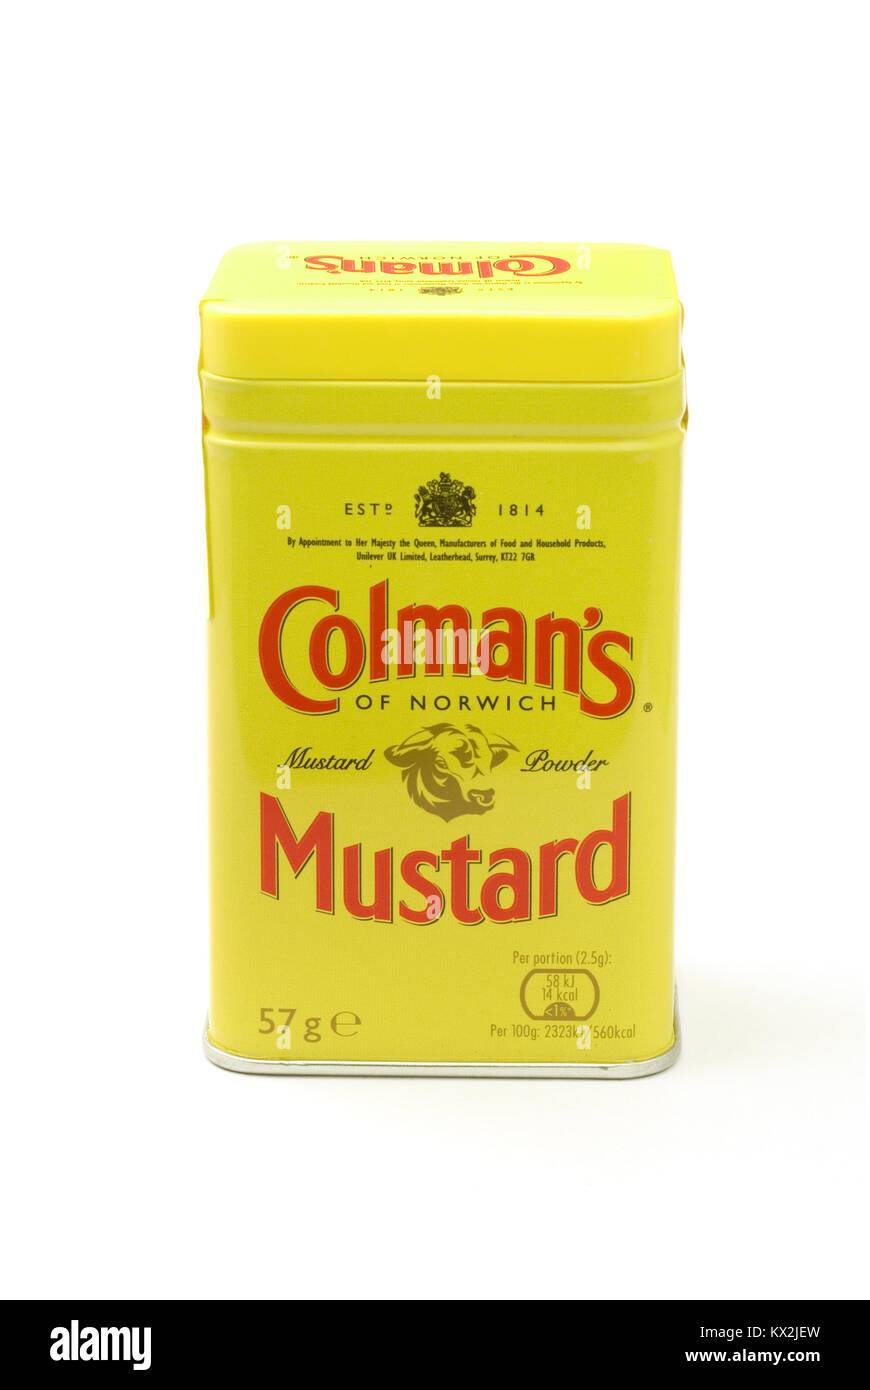 Colmans Mustard - Stock Image